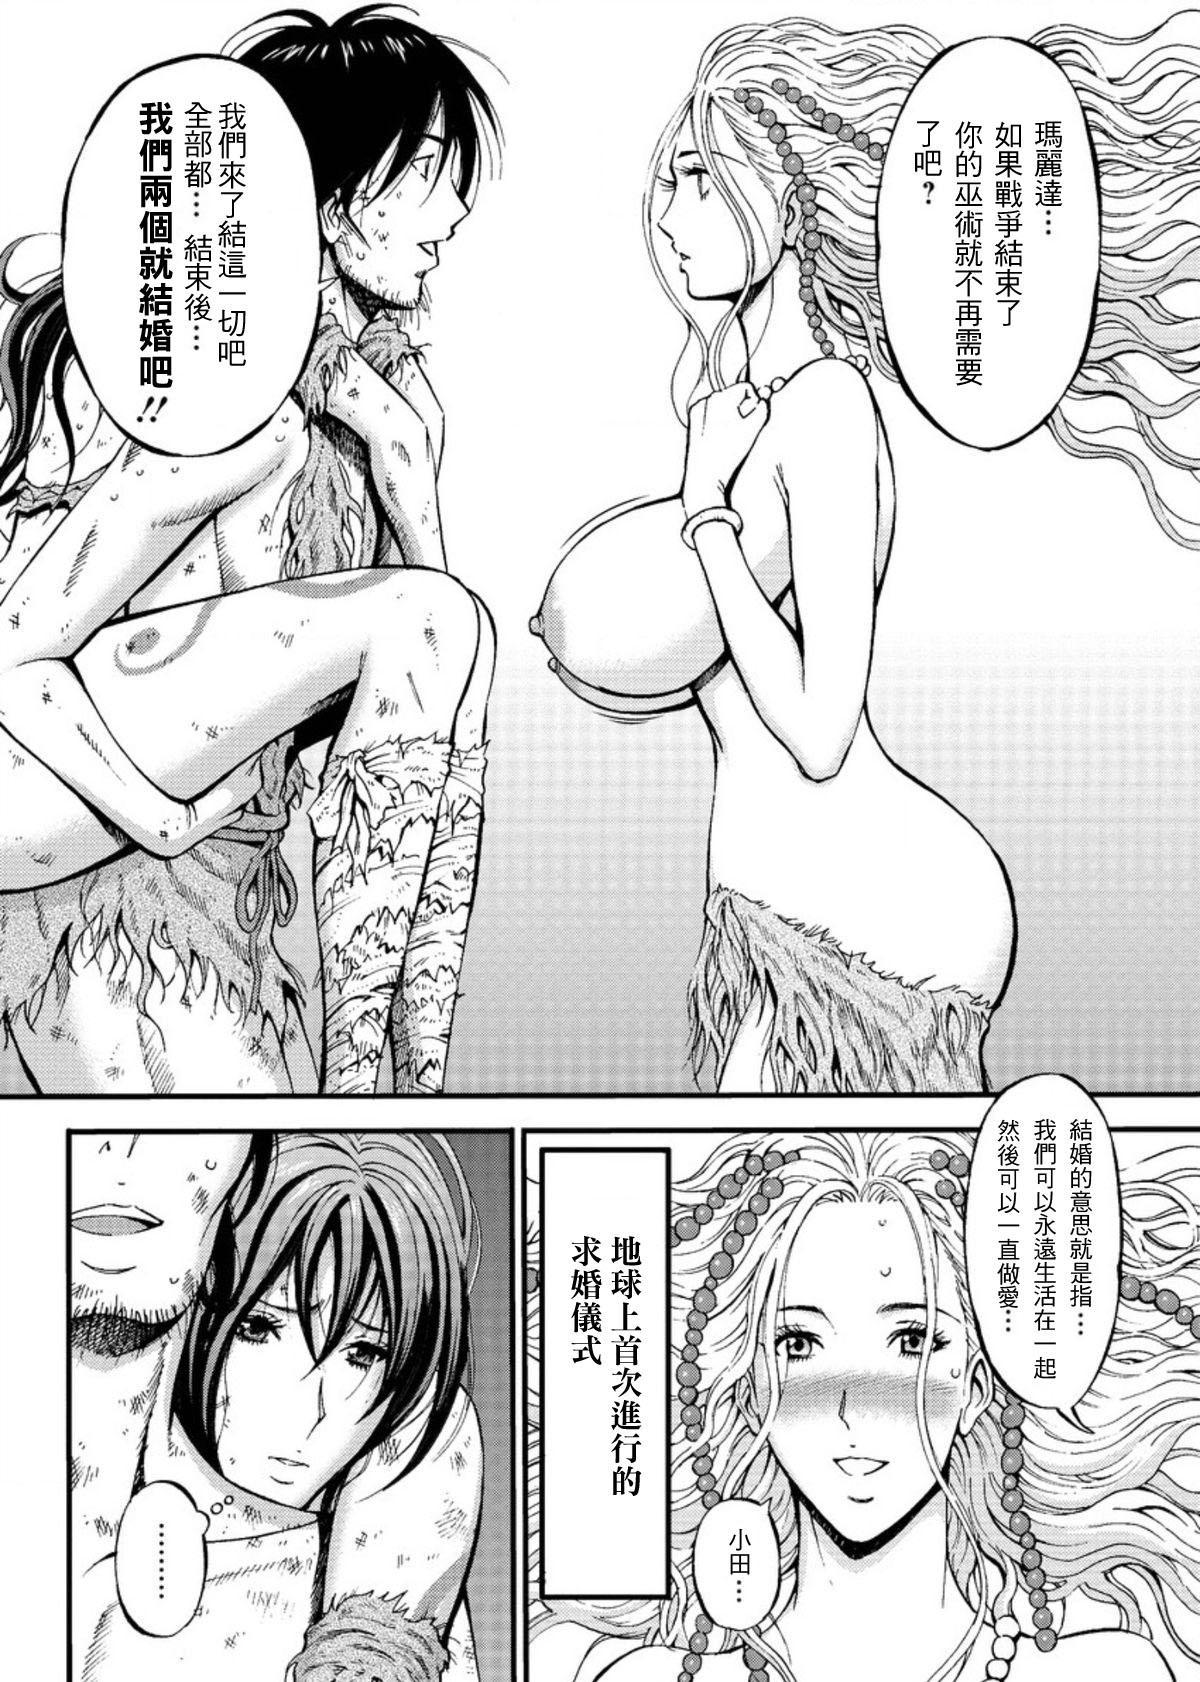 Kigenzen 10000 Nen no Ota | 史前一萬年的宅男 Ch. 19-24 102